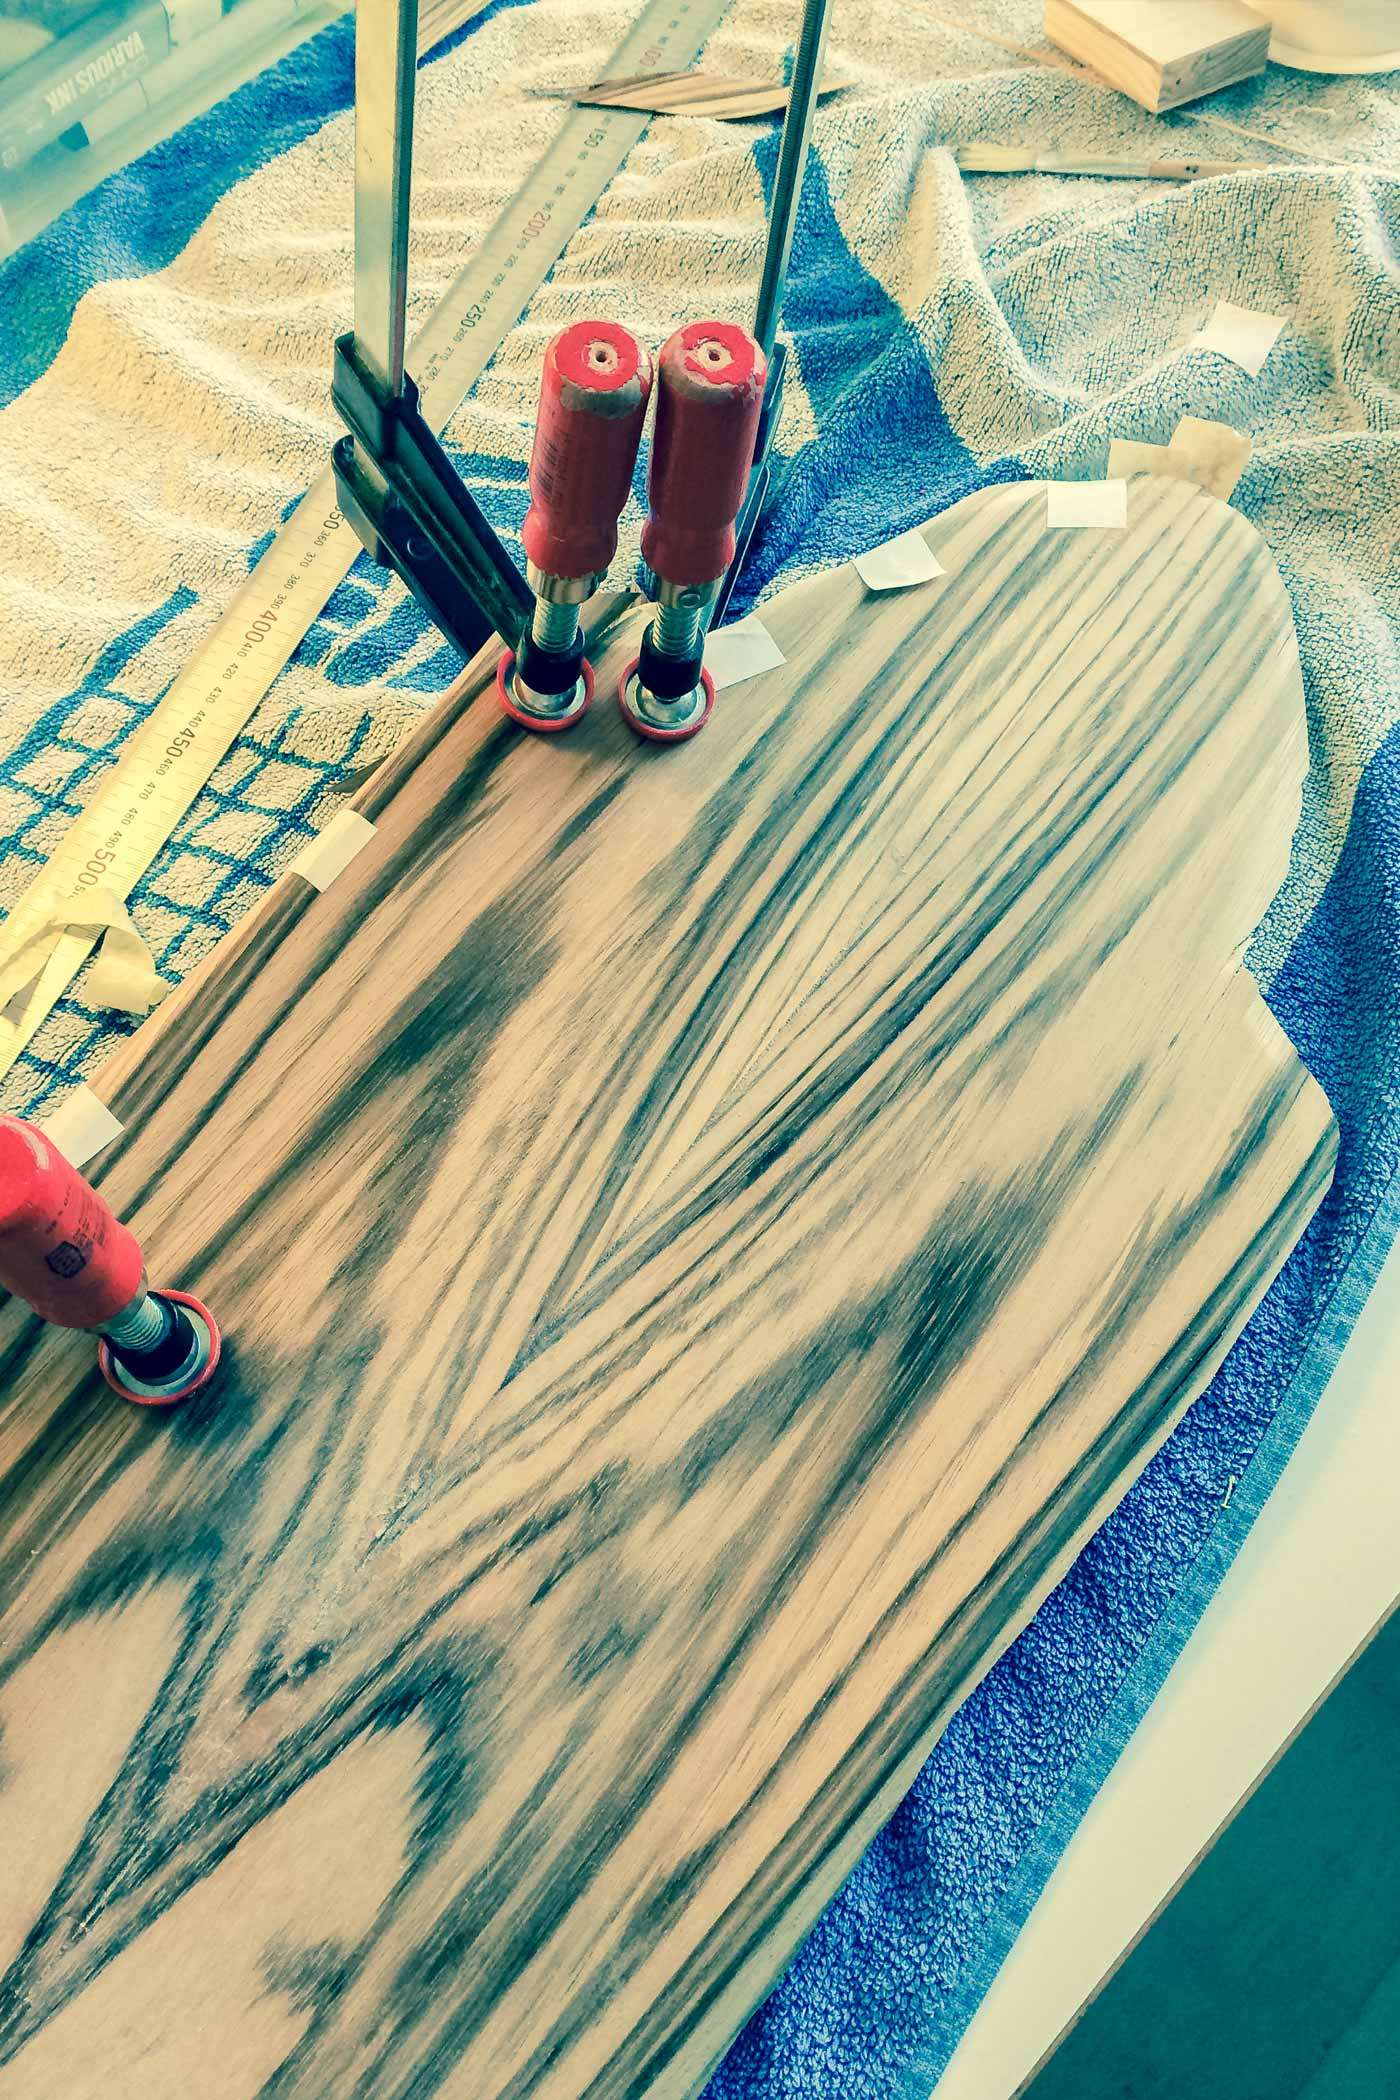 almost finished work of laying down zebra wood veneer on WACH designstudio longboard deck